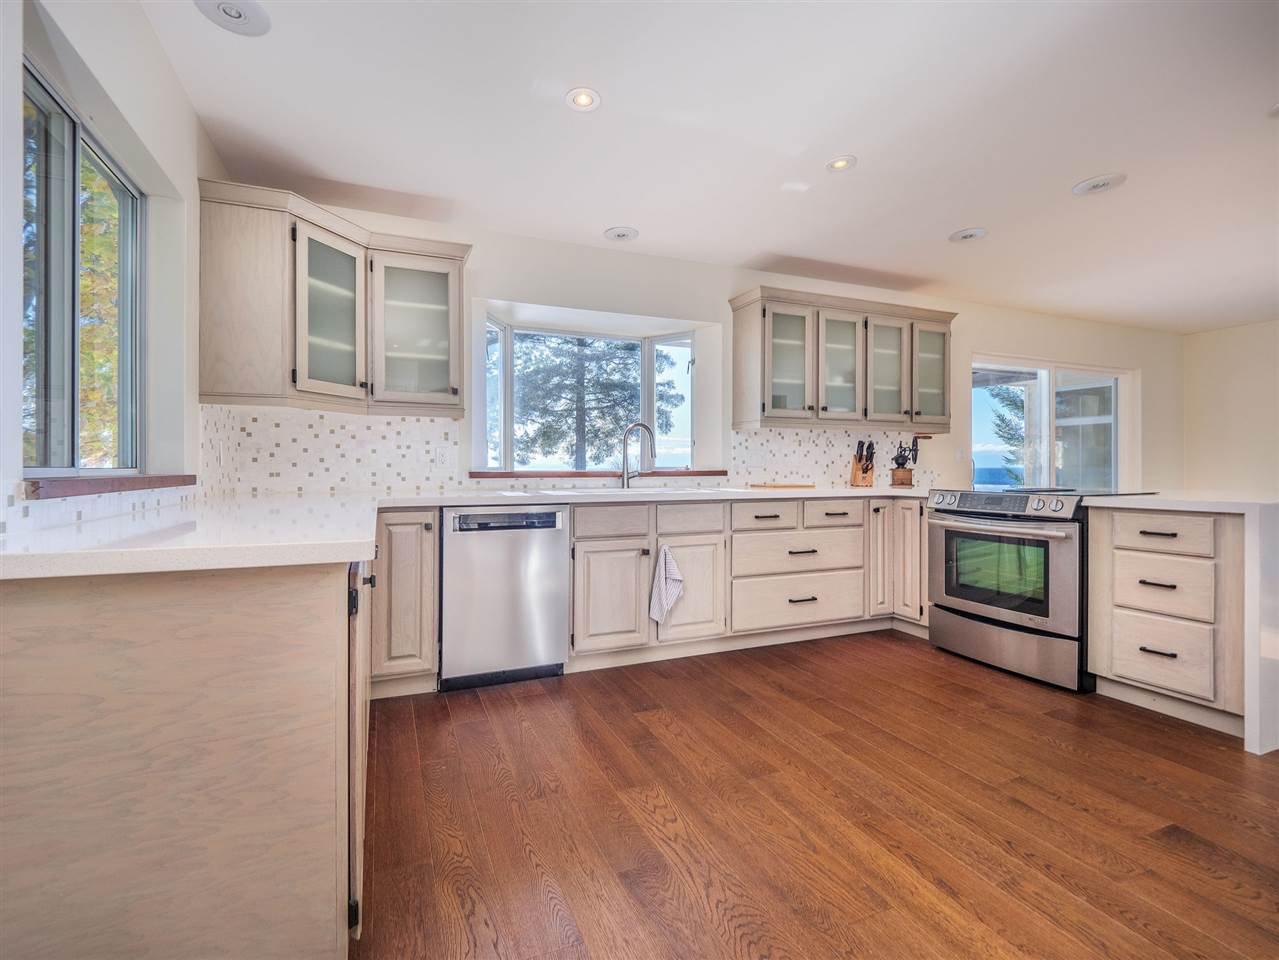 "Photo 20: Photos: 7101 DALE Road in Sechelt: Sechelt District House for sale in ""Caleda Estates"" (Sunshine Coast)  : MLS®# R2515160"